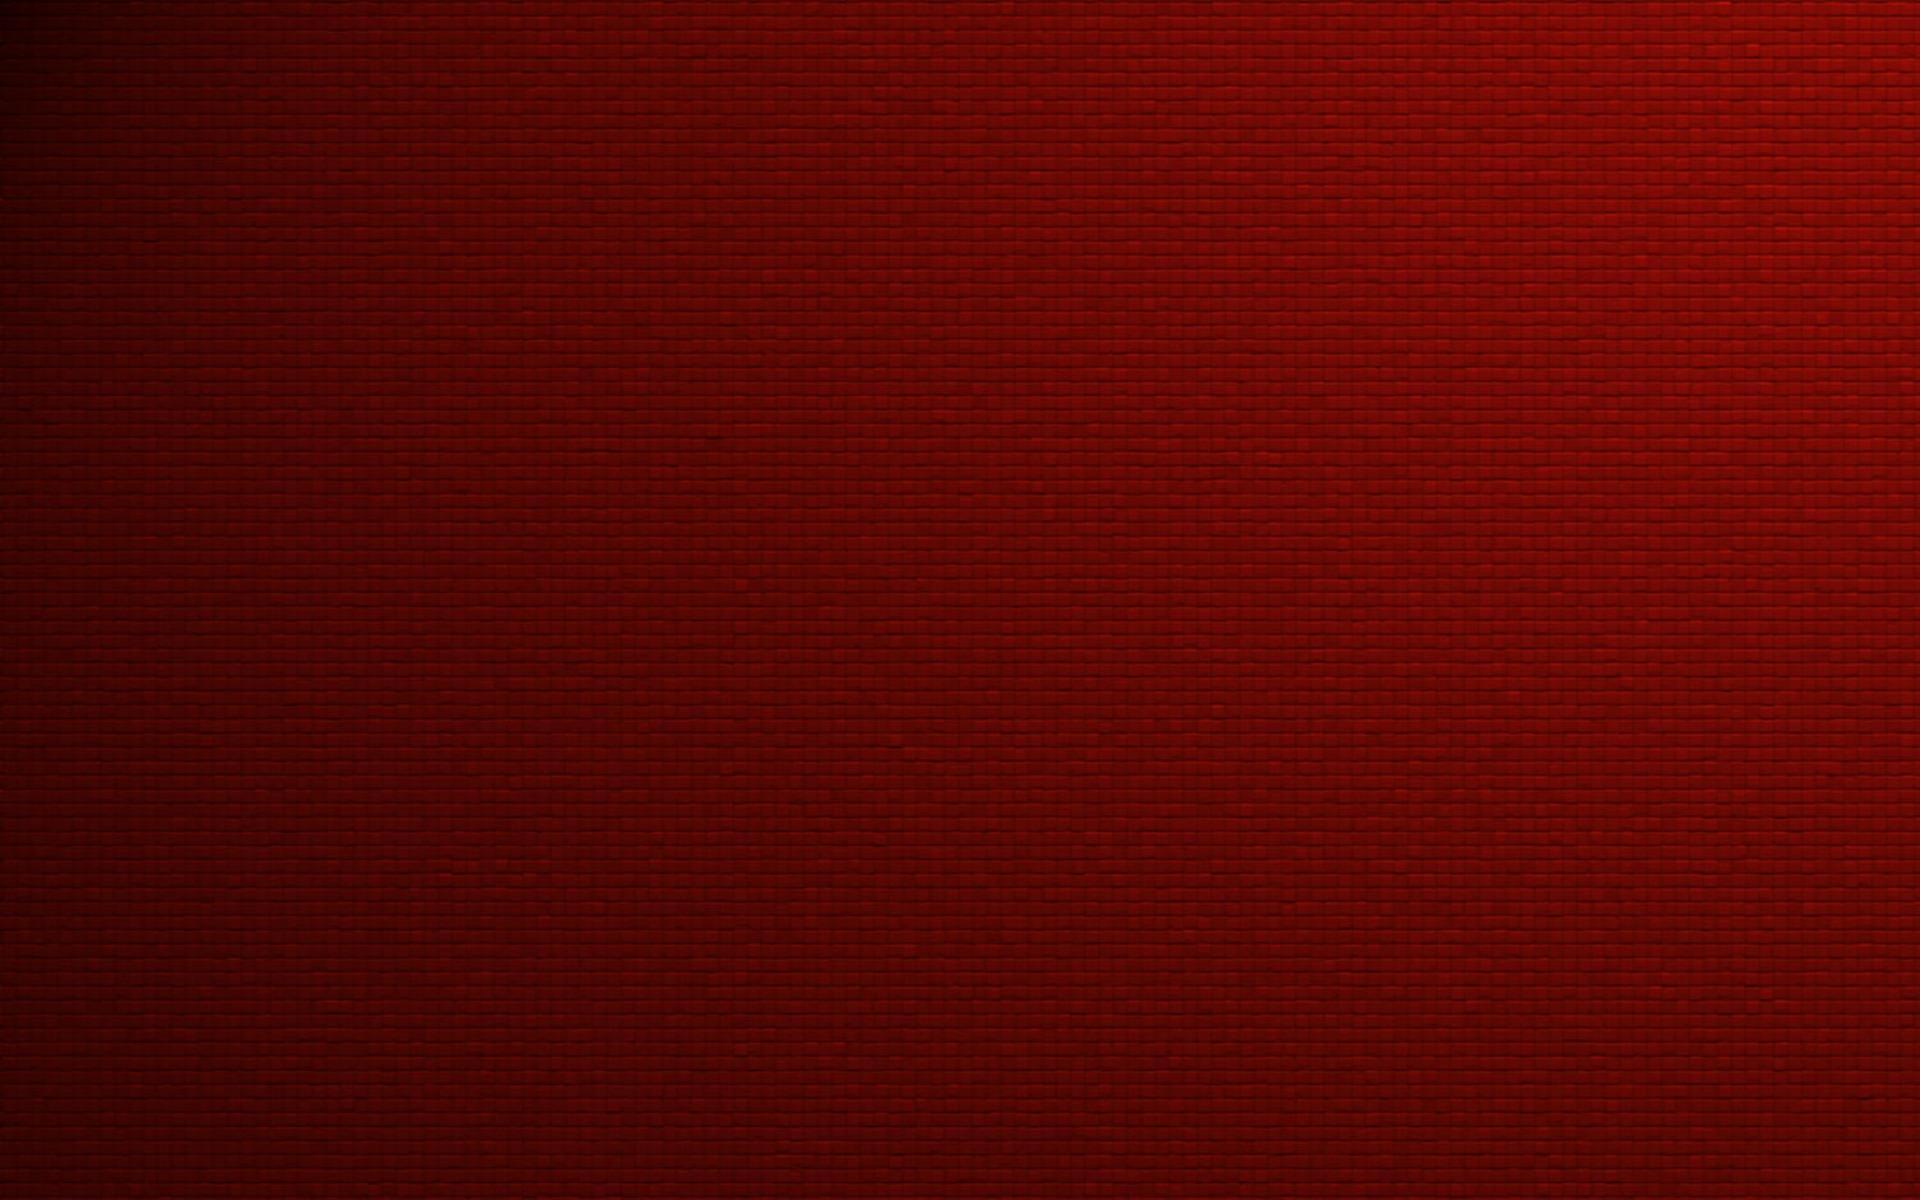 space desktop backgrounds hd red star wallpaper 1680x1050px